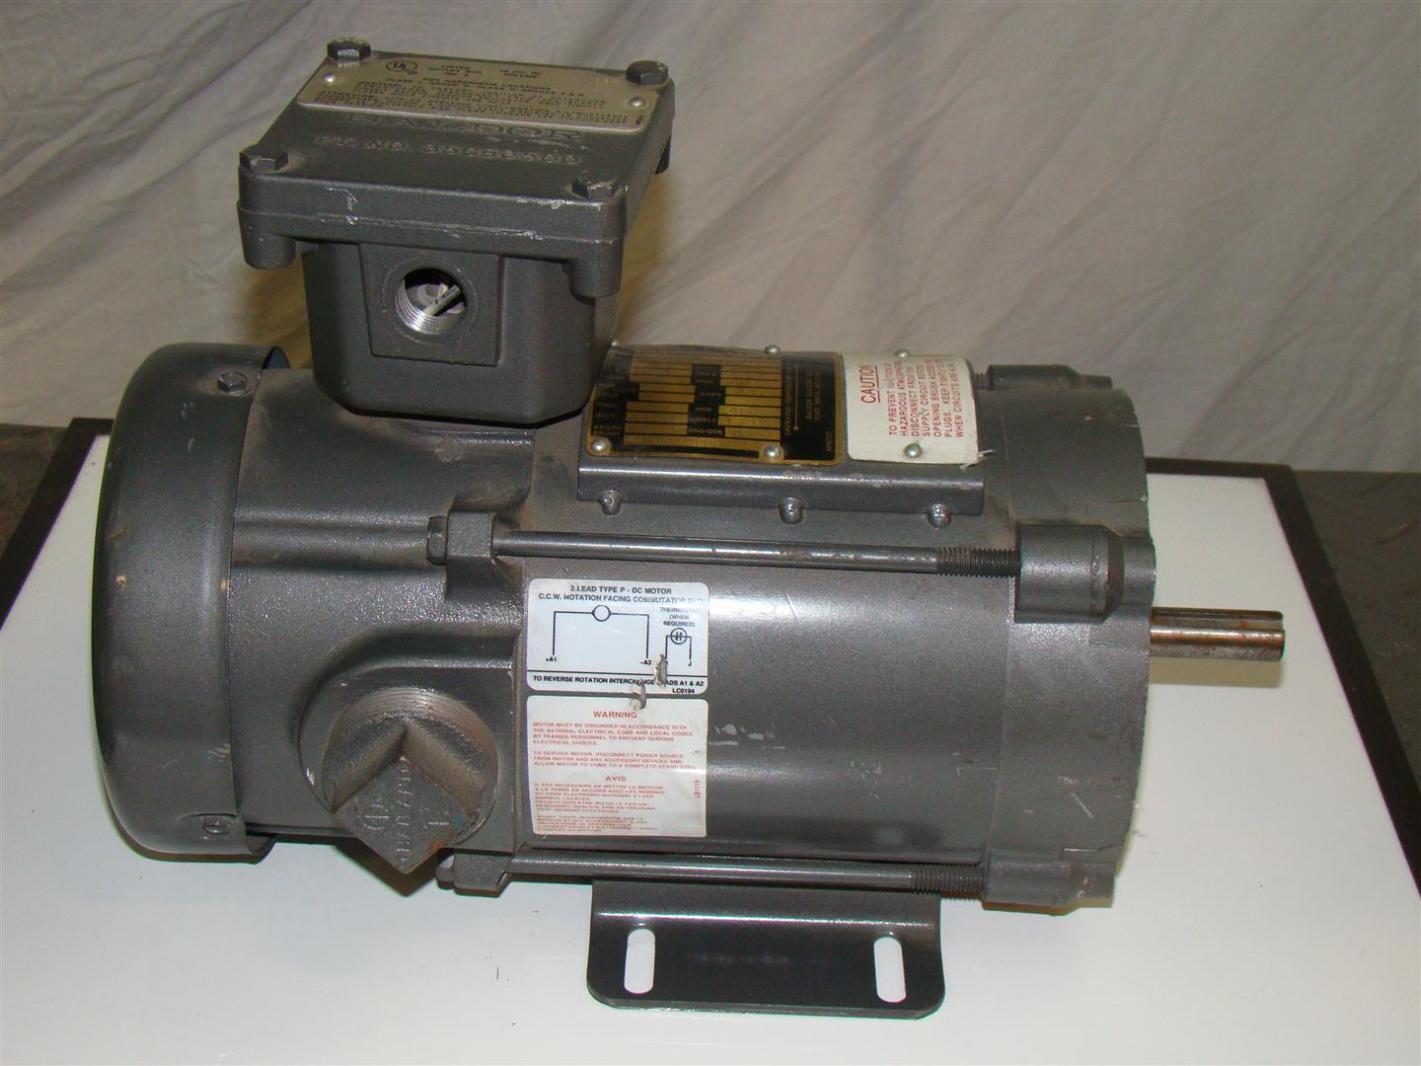 Baldor Hazardous Dc Motor 90v 1 4hp 1750rpm 34ep3705 F